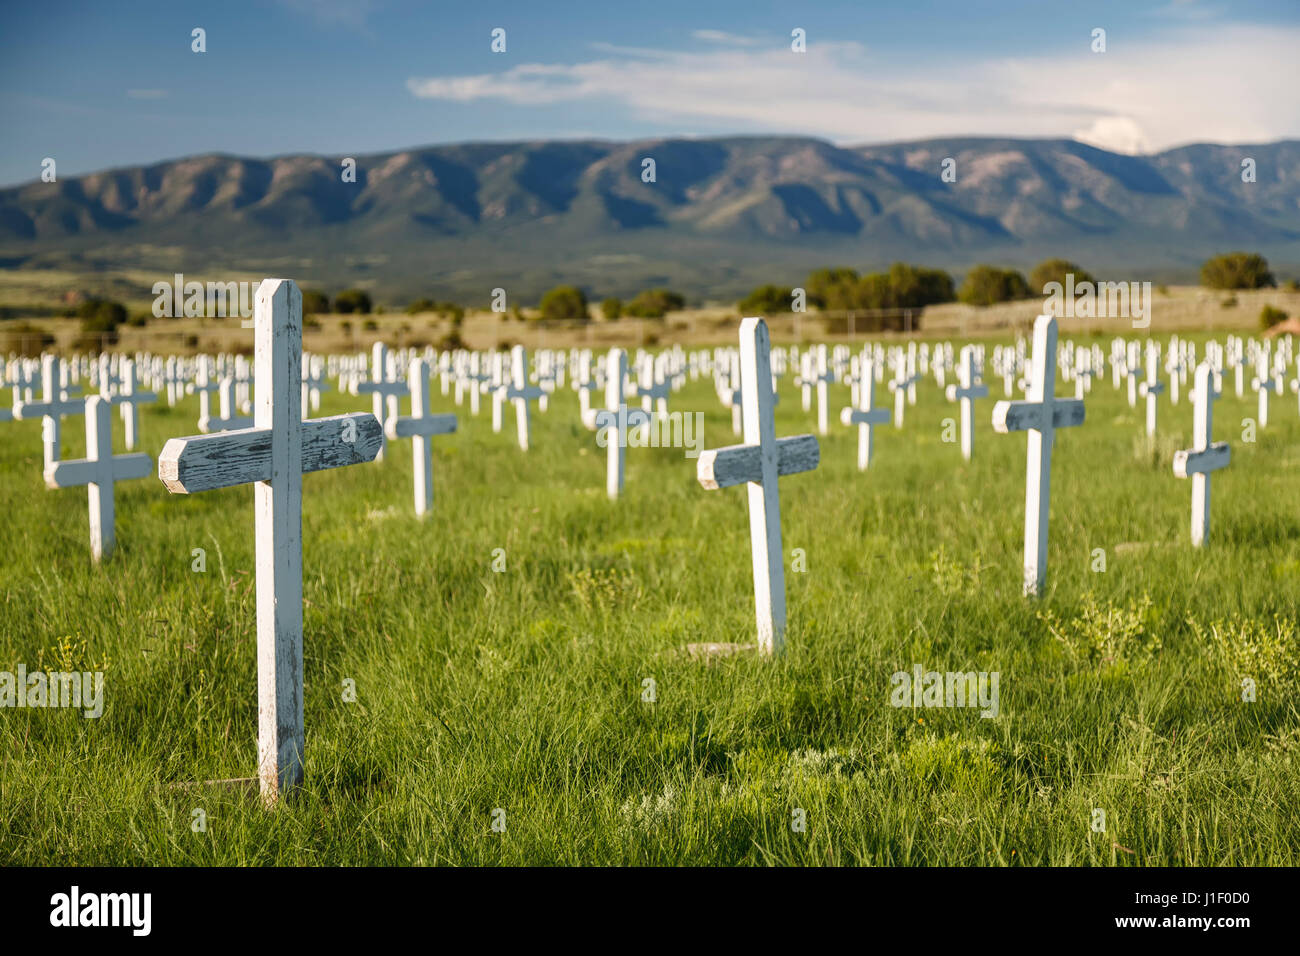 Crosses fort stanton merchant marine military cemetery fort stanton new mexico usa